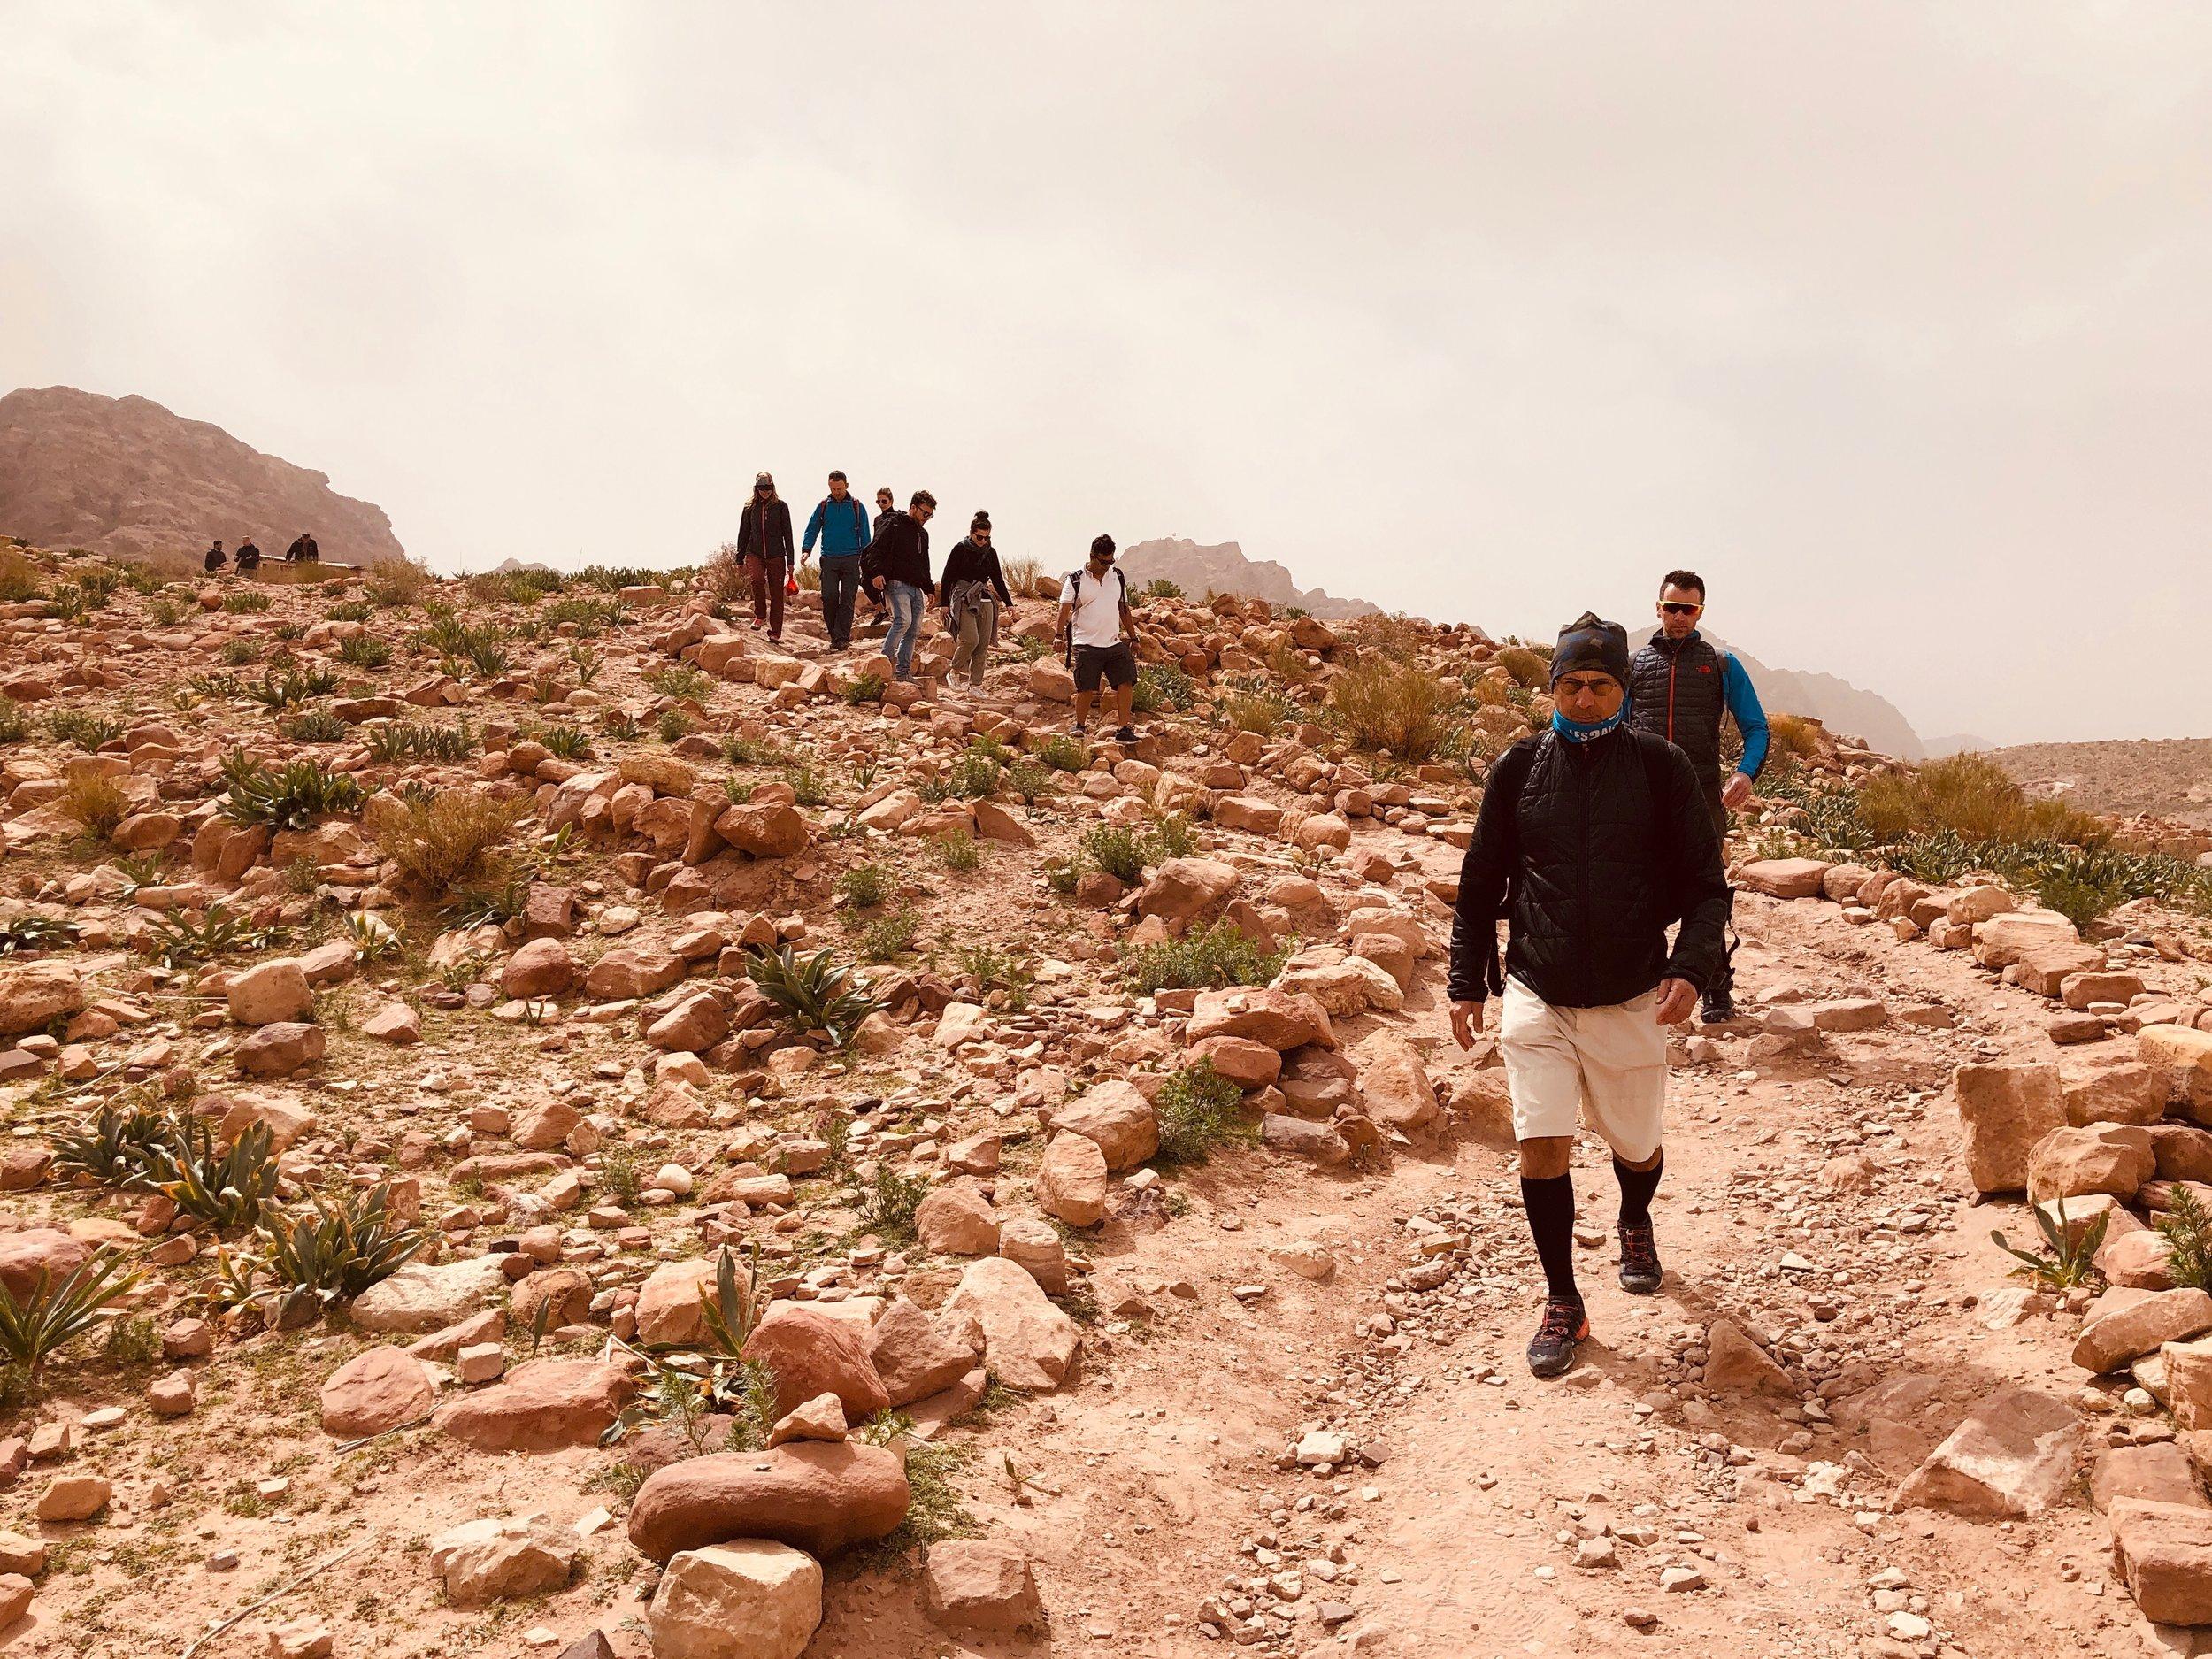 petra_hiking 1.jpg